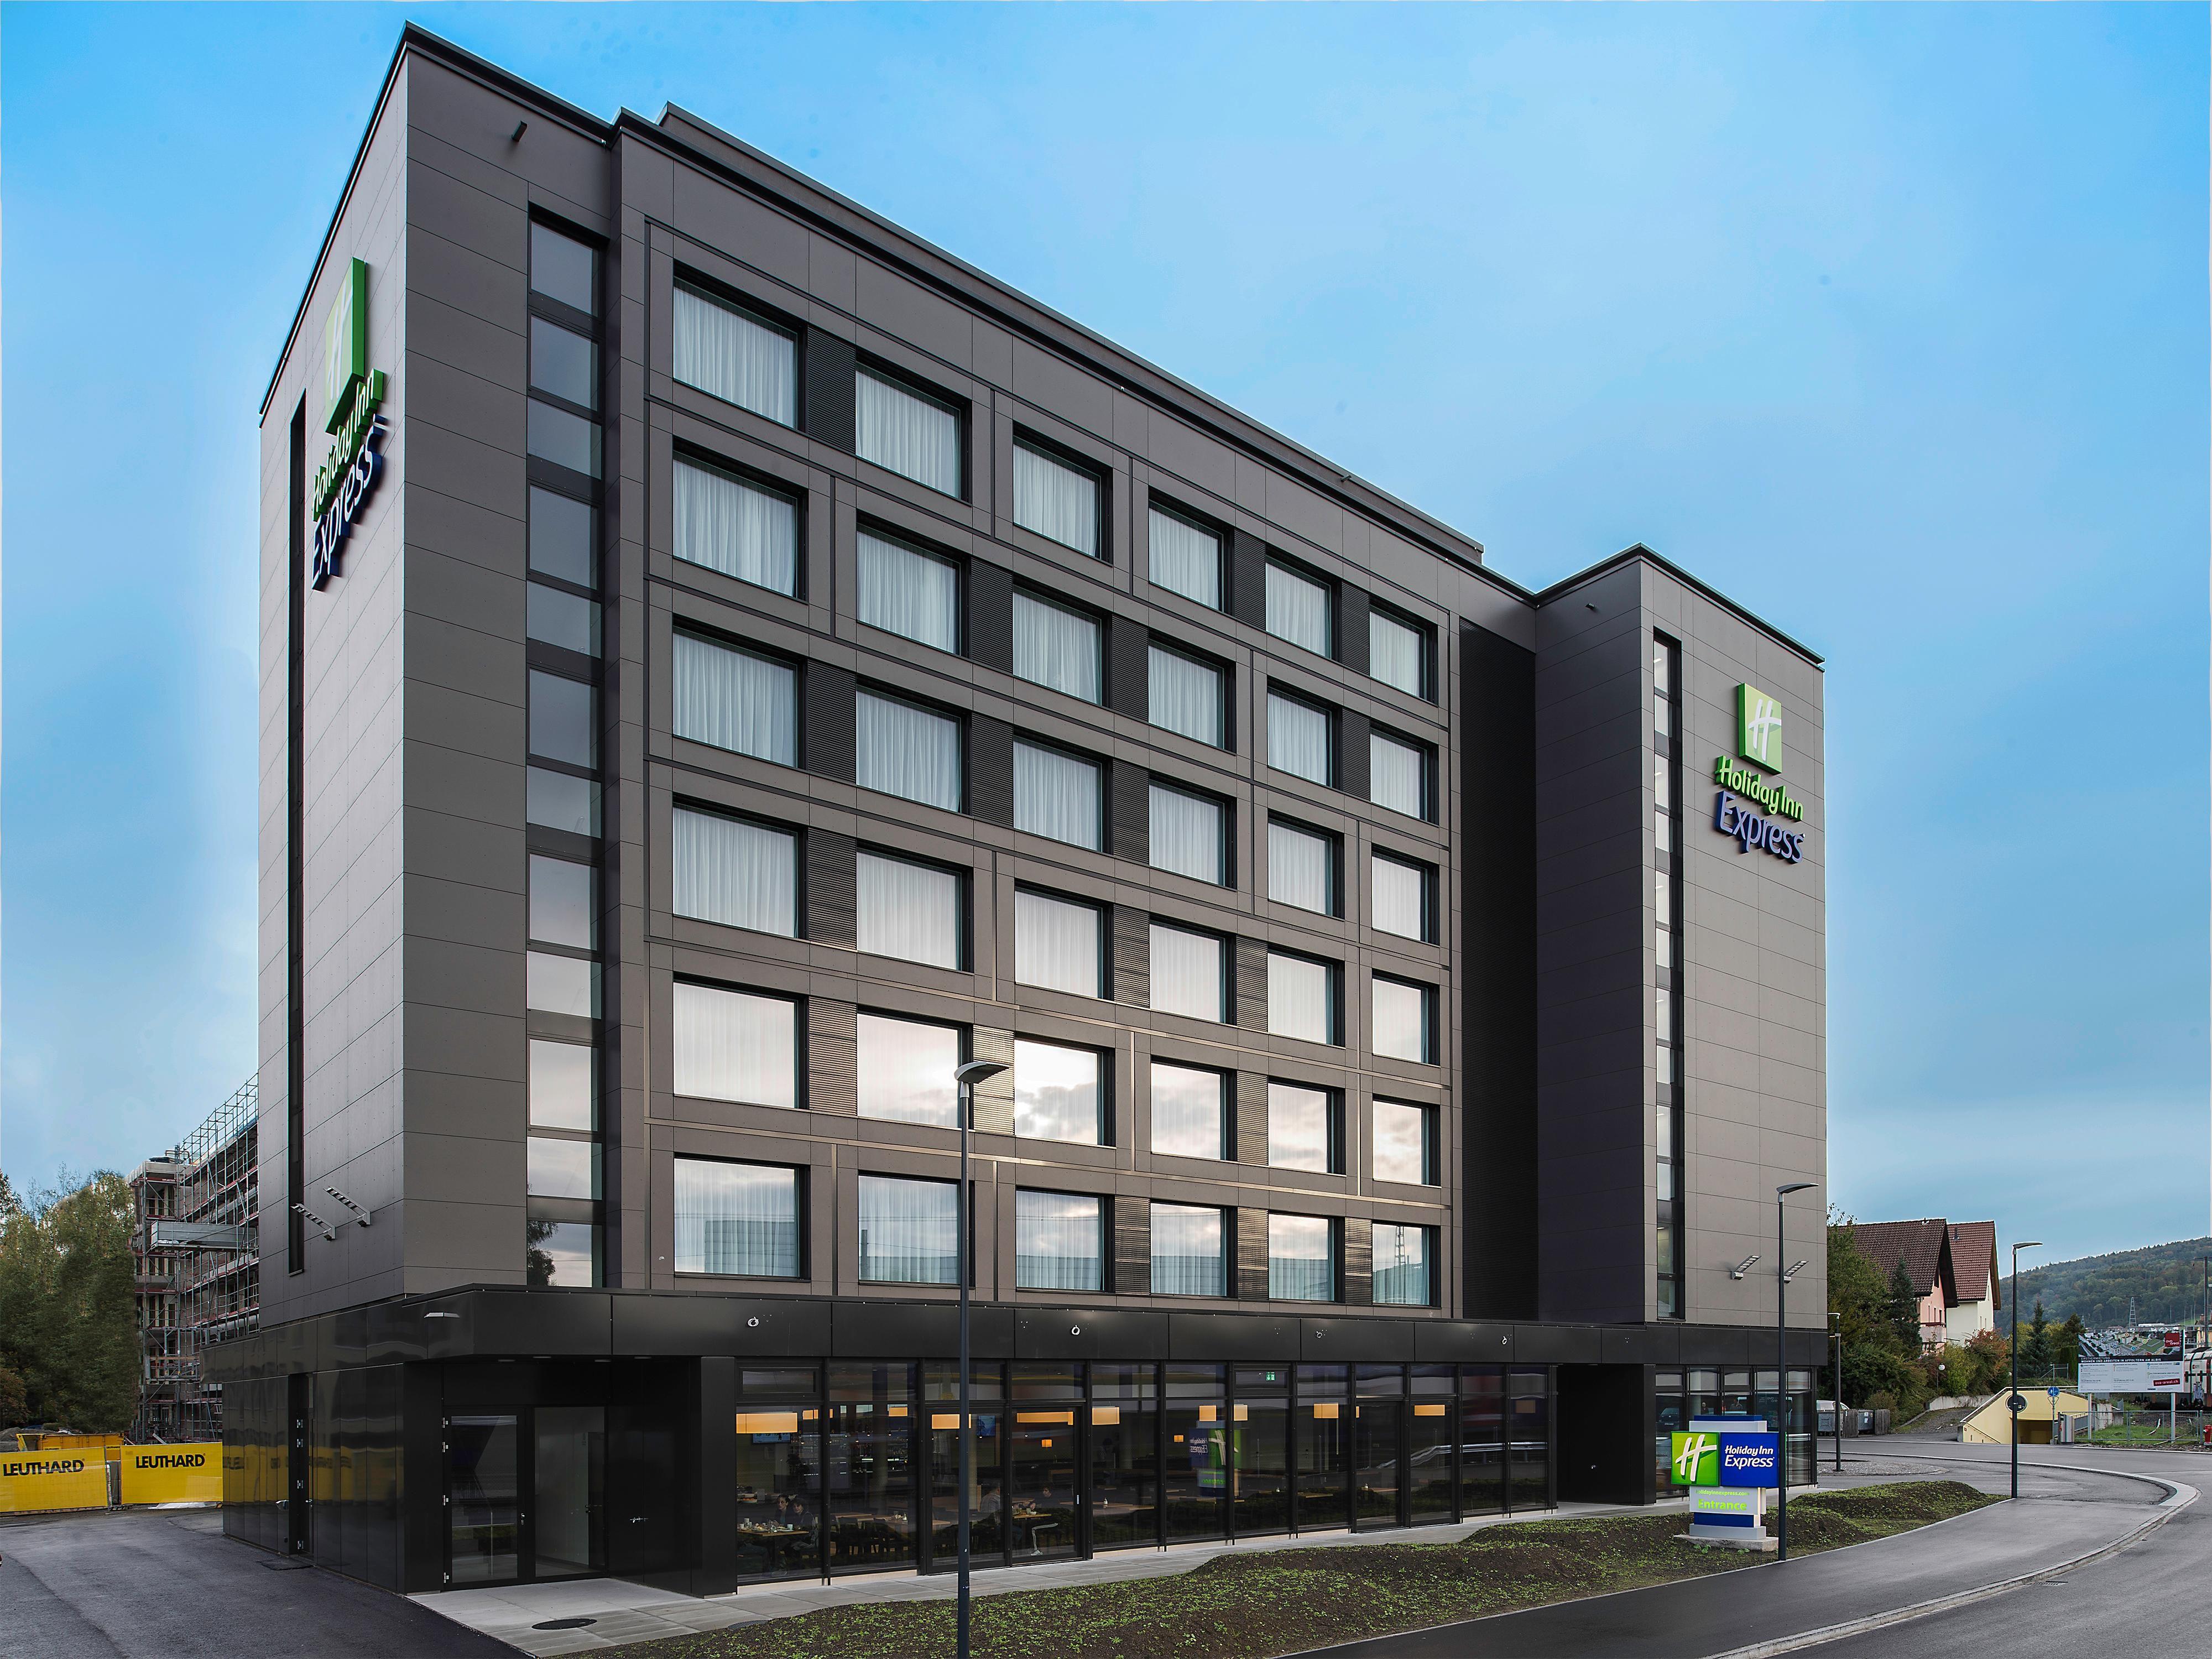 Holiday inn express affoltern am albis hotel by ihg for Innendekoration affoltern am albis